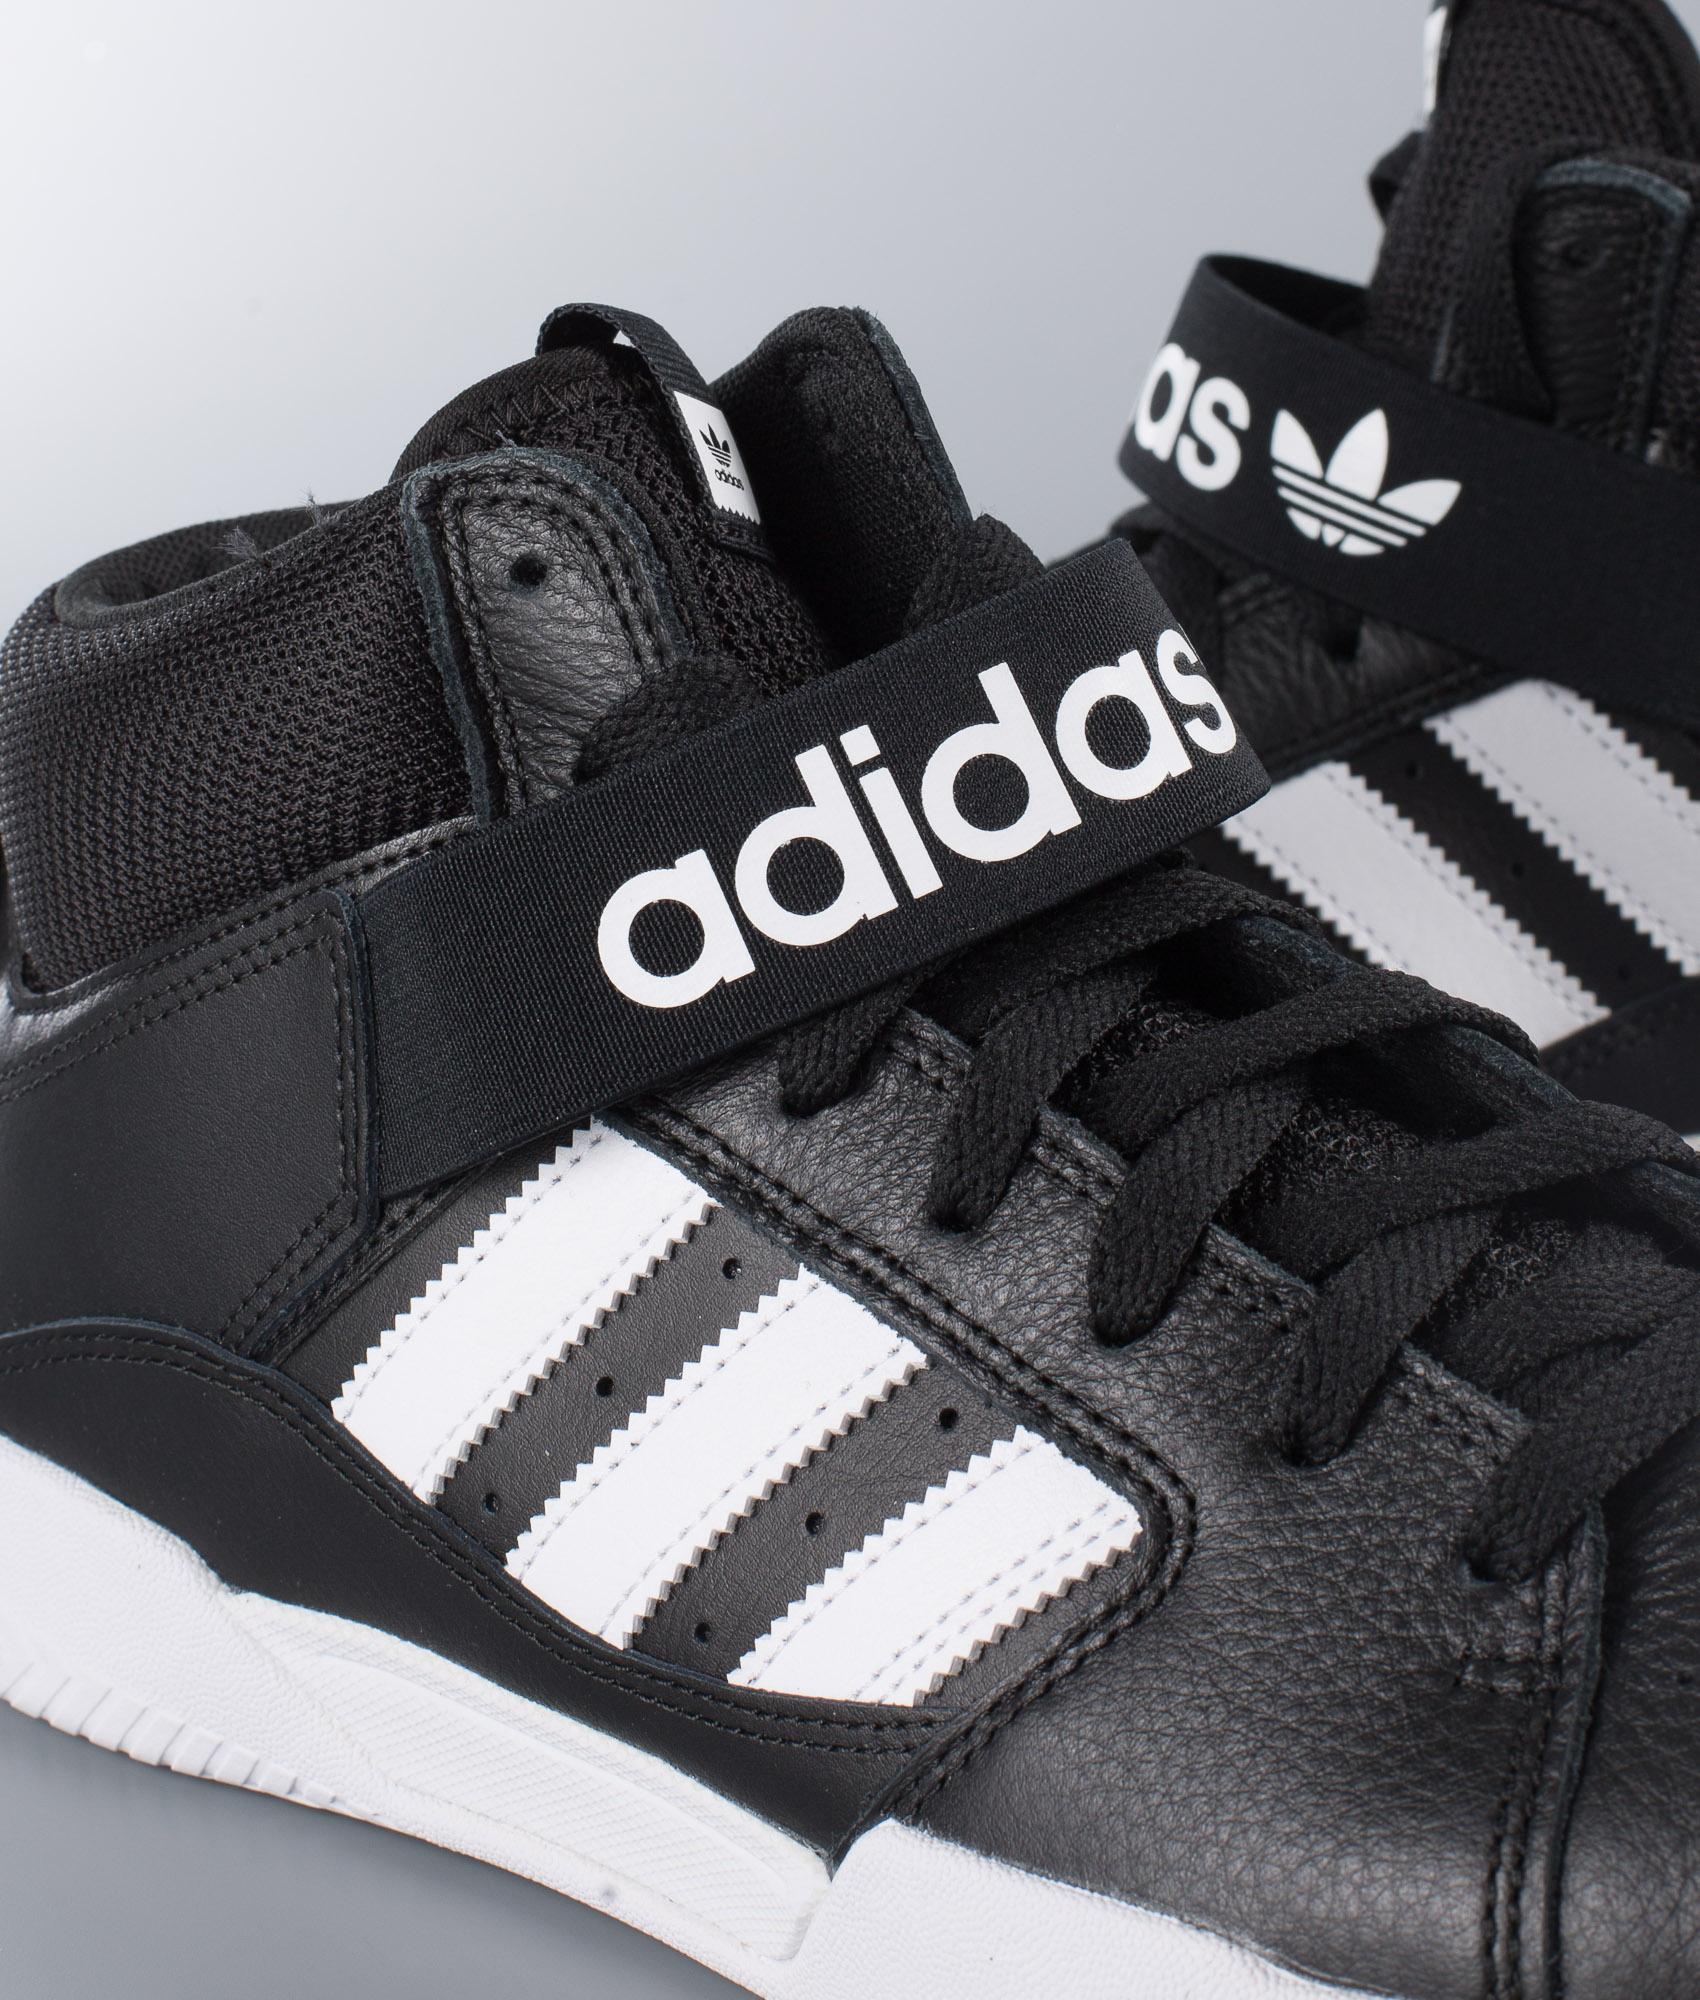 Adidas Schuhe White Blackftwr Mid Core Vrx Whiteftwr Skateboarding ynO8vwmNP0